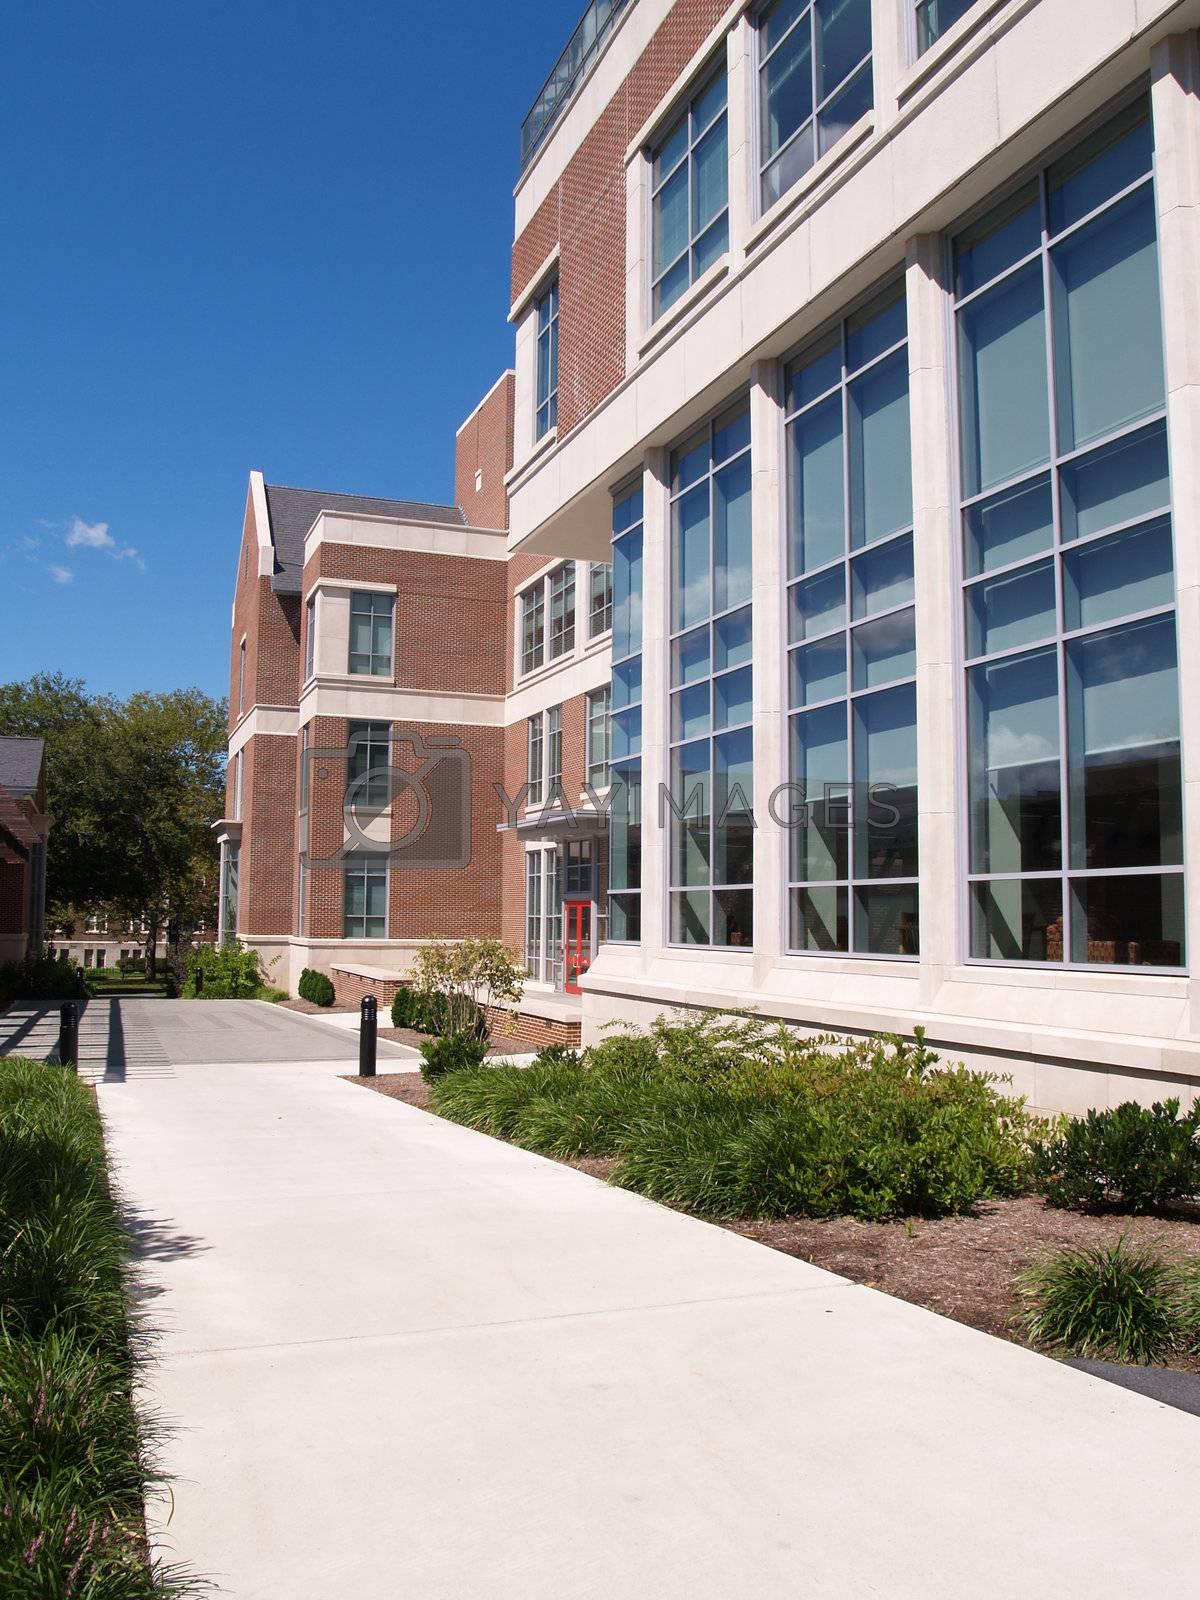 modern brick building with many glass windows